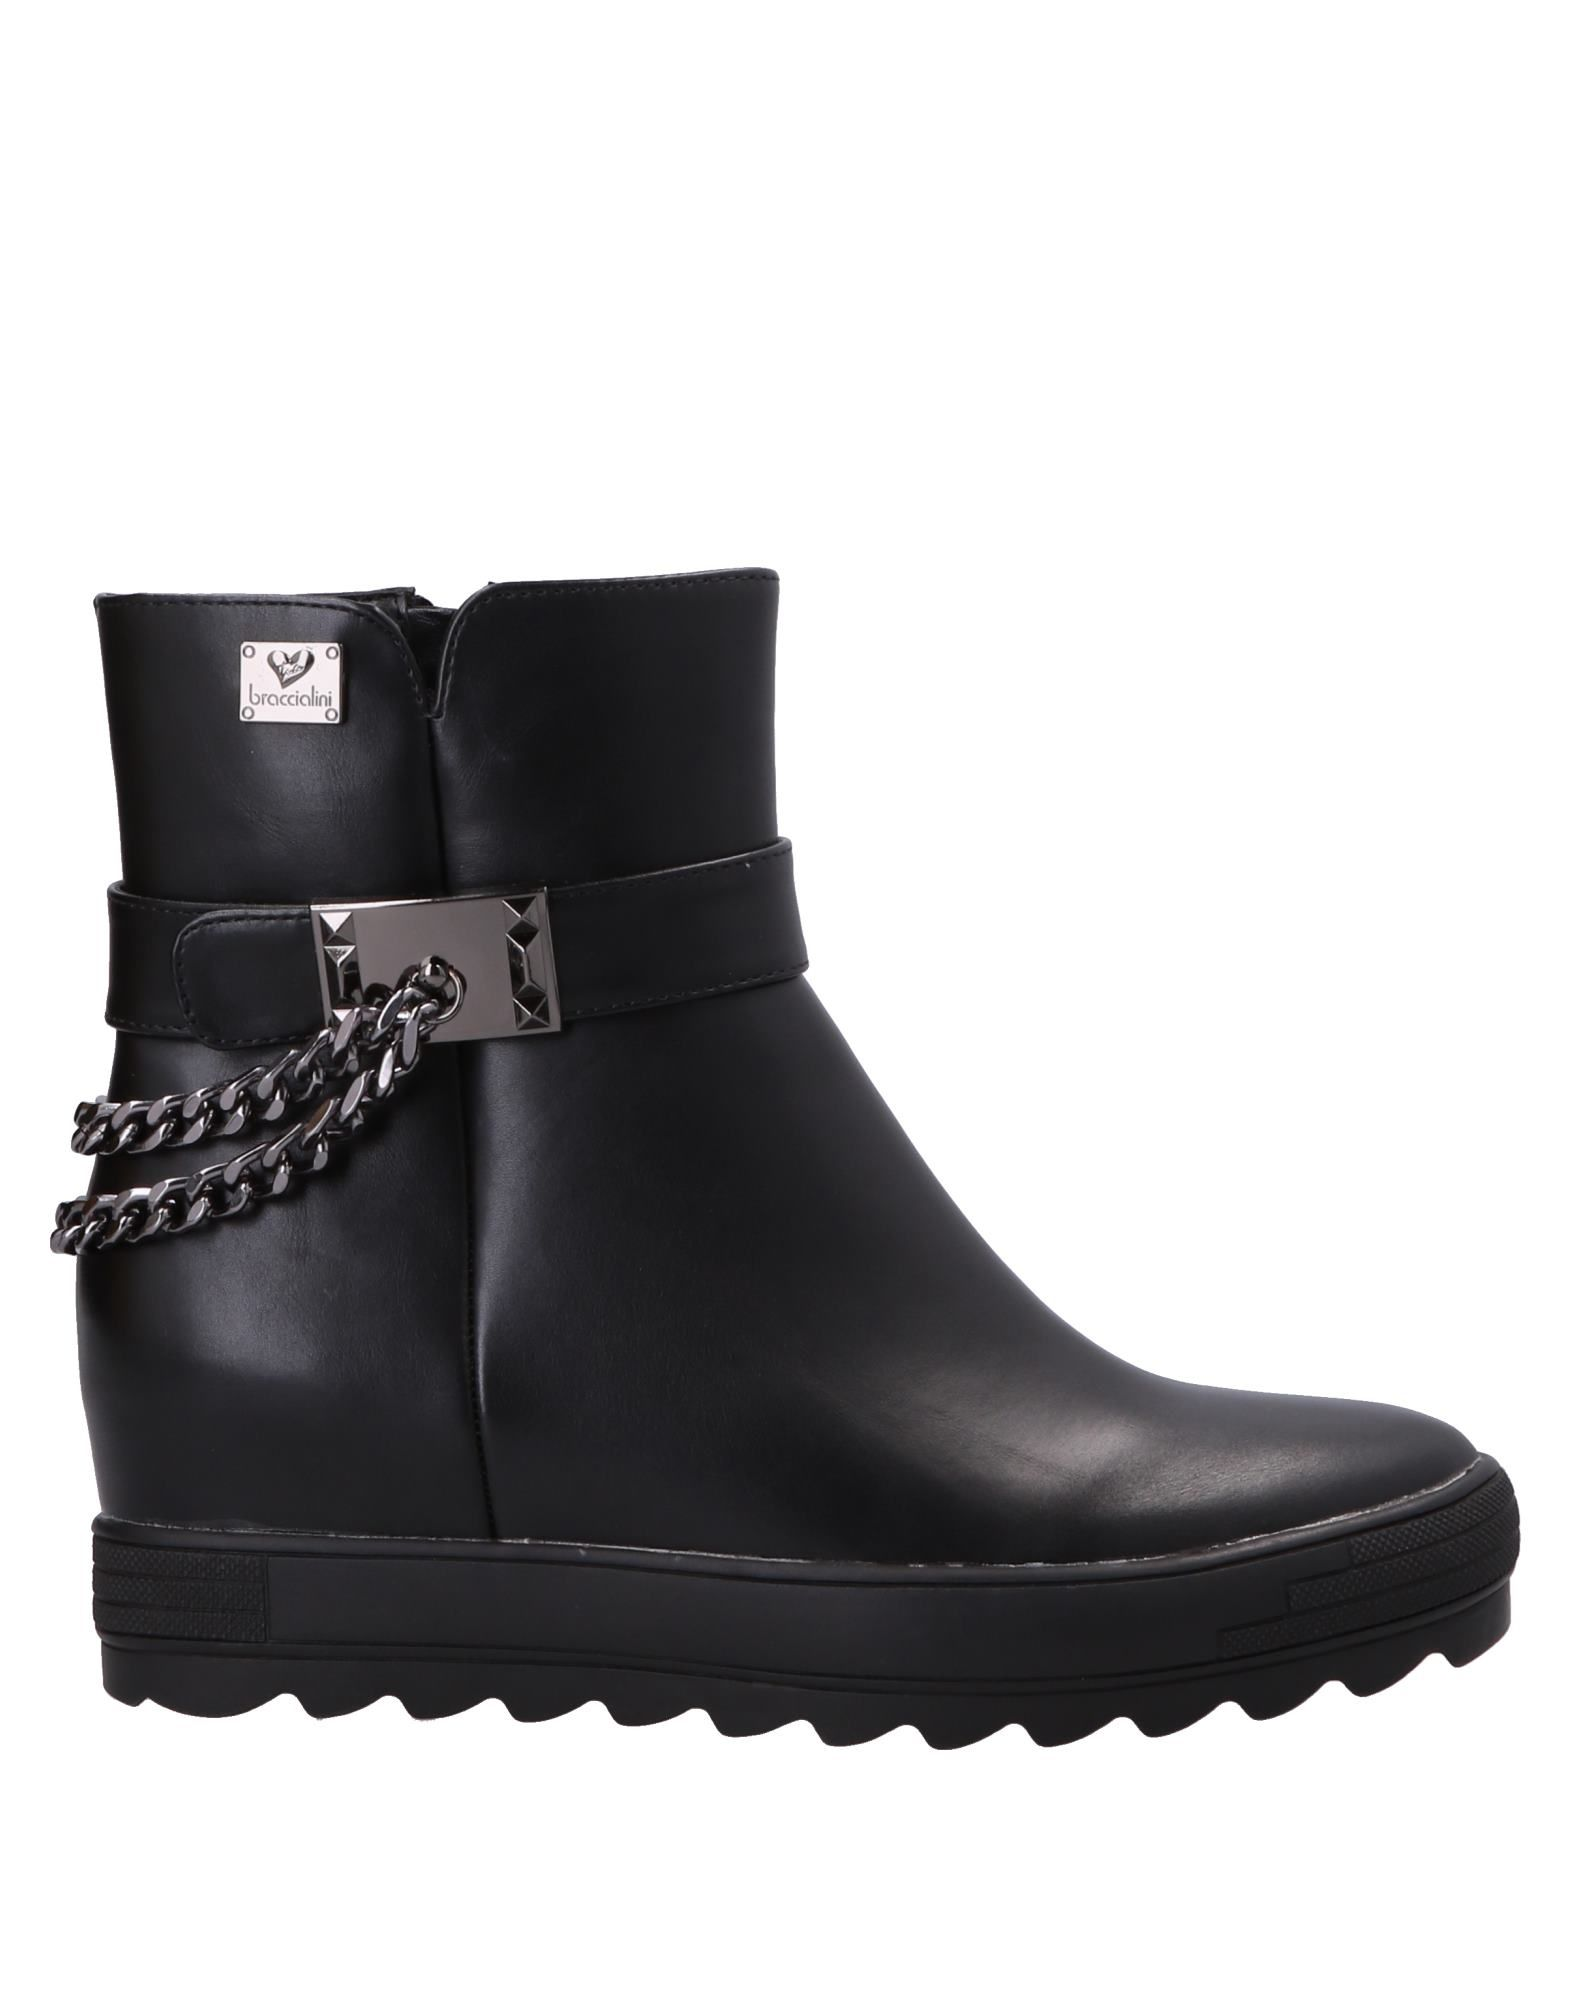 Tua By Braccialini Stiefelette Damen  11526208SH Gute Qualität beliebte Schuhe